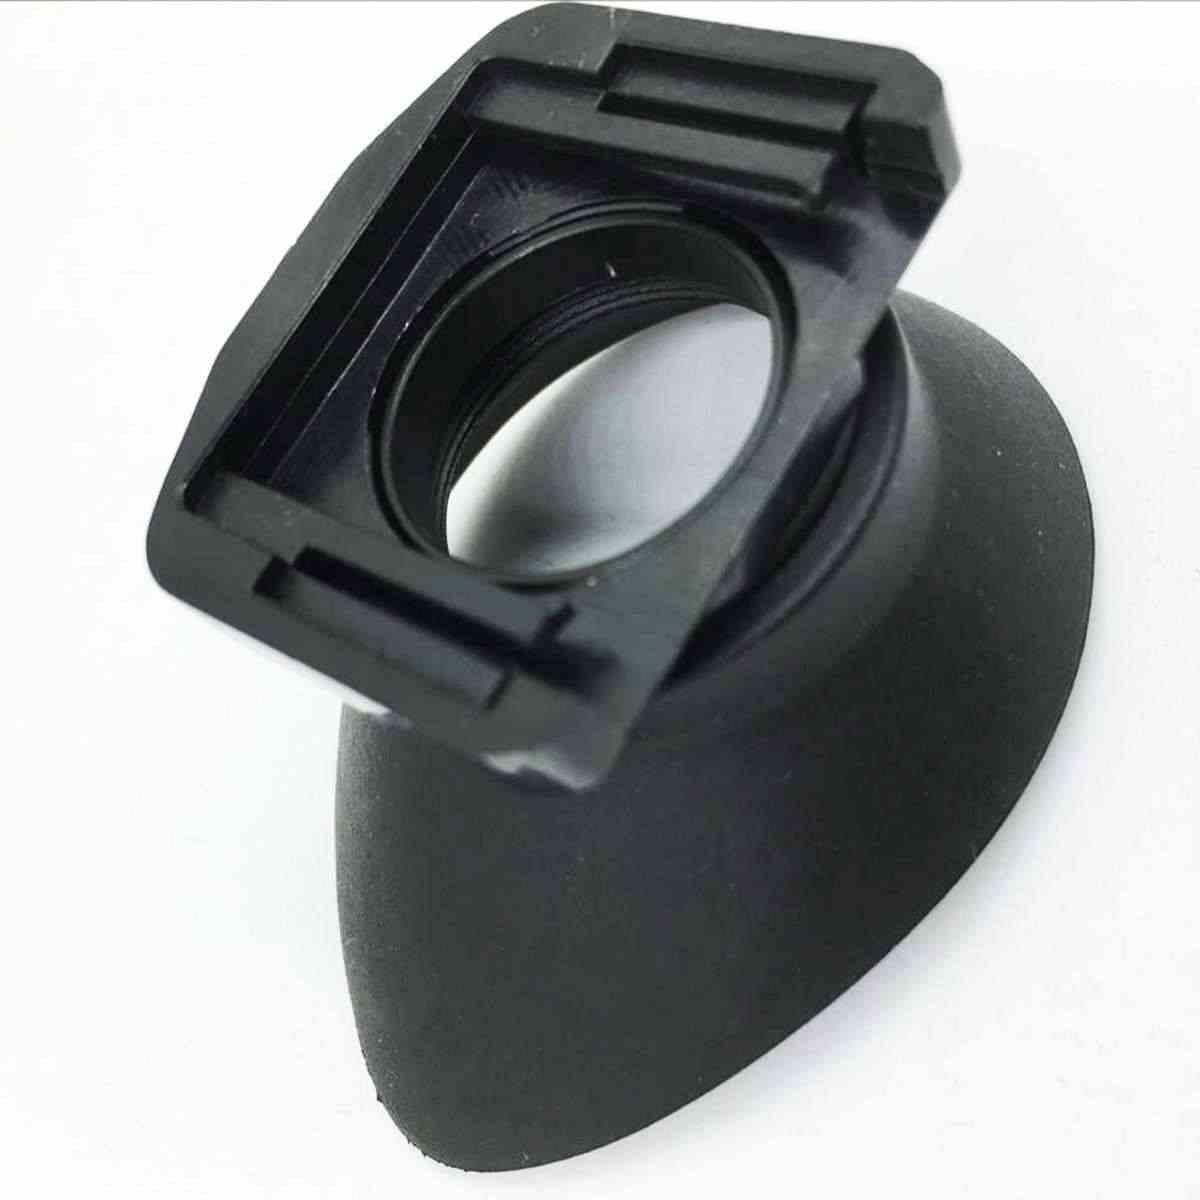 Резиновый окуляр наглазник для EG Canon EO 1D Mark III IV 1DS III 1D X 5D III 5DS R 7D 7D Mark II